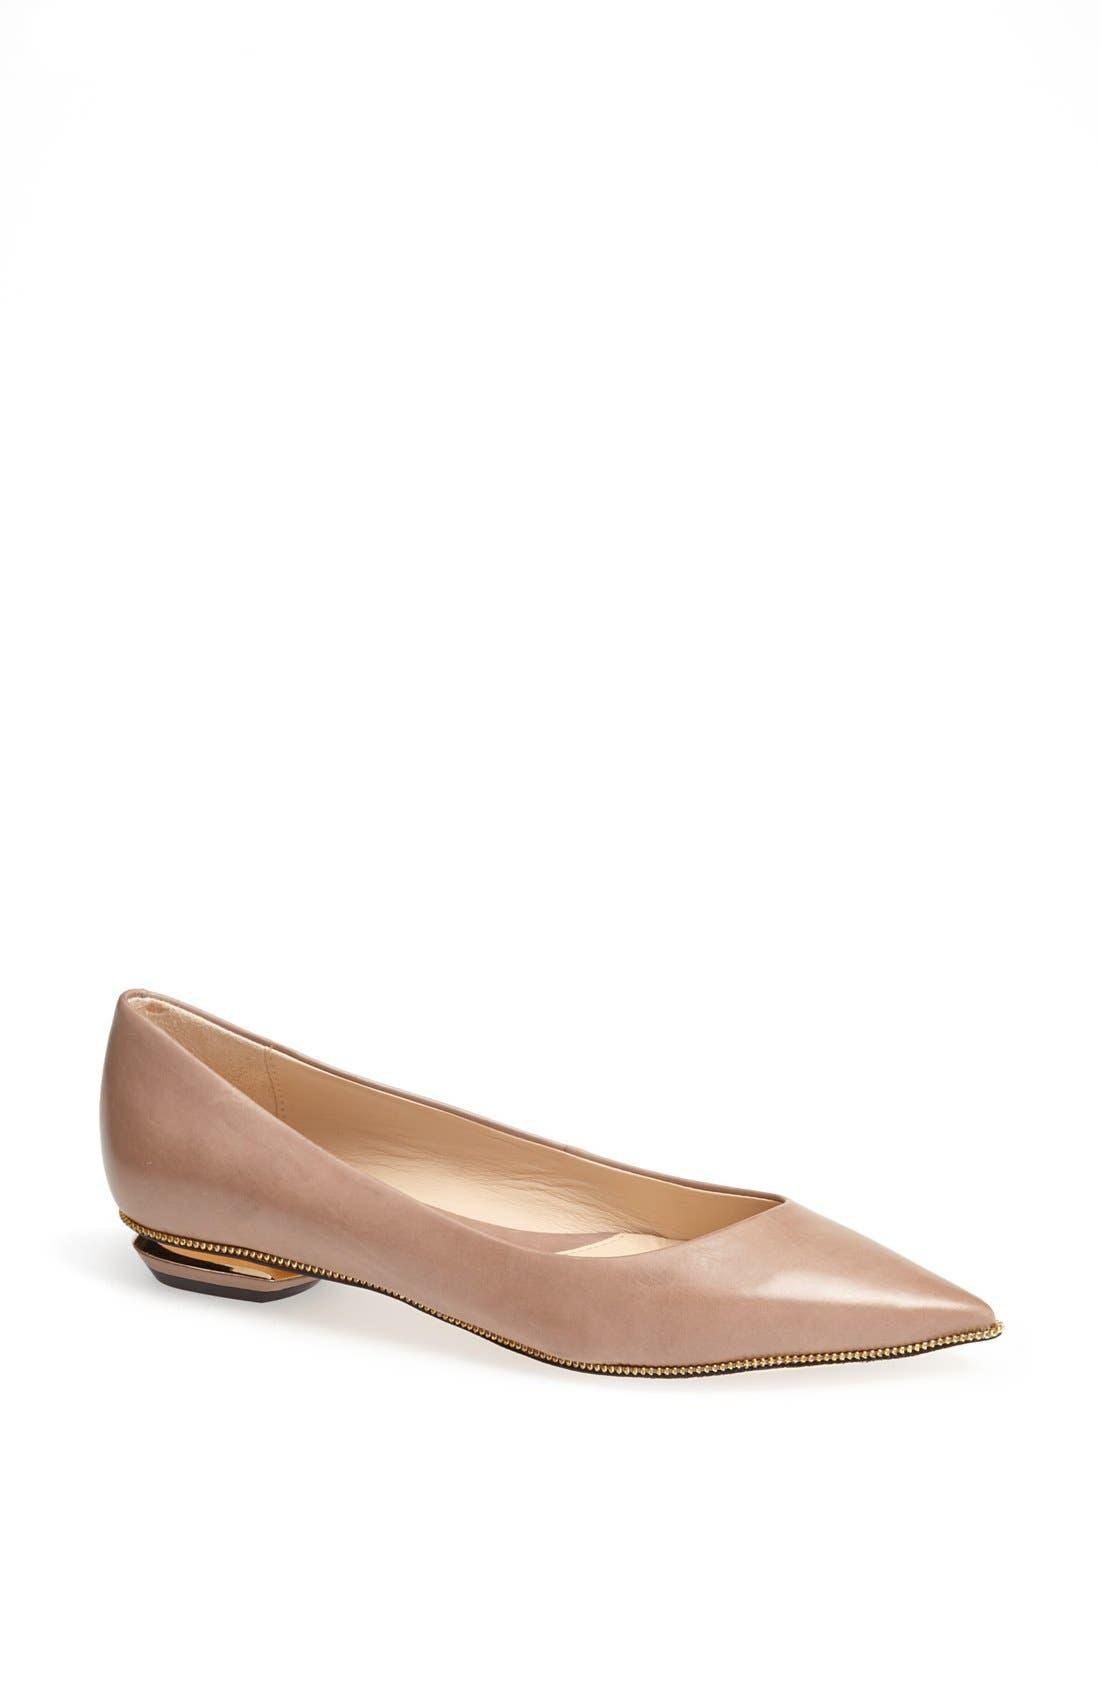 Main Image - Carolinna Espinosa 'Sandra' Leather Flat